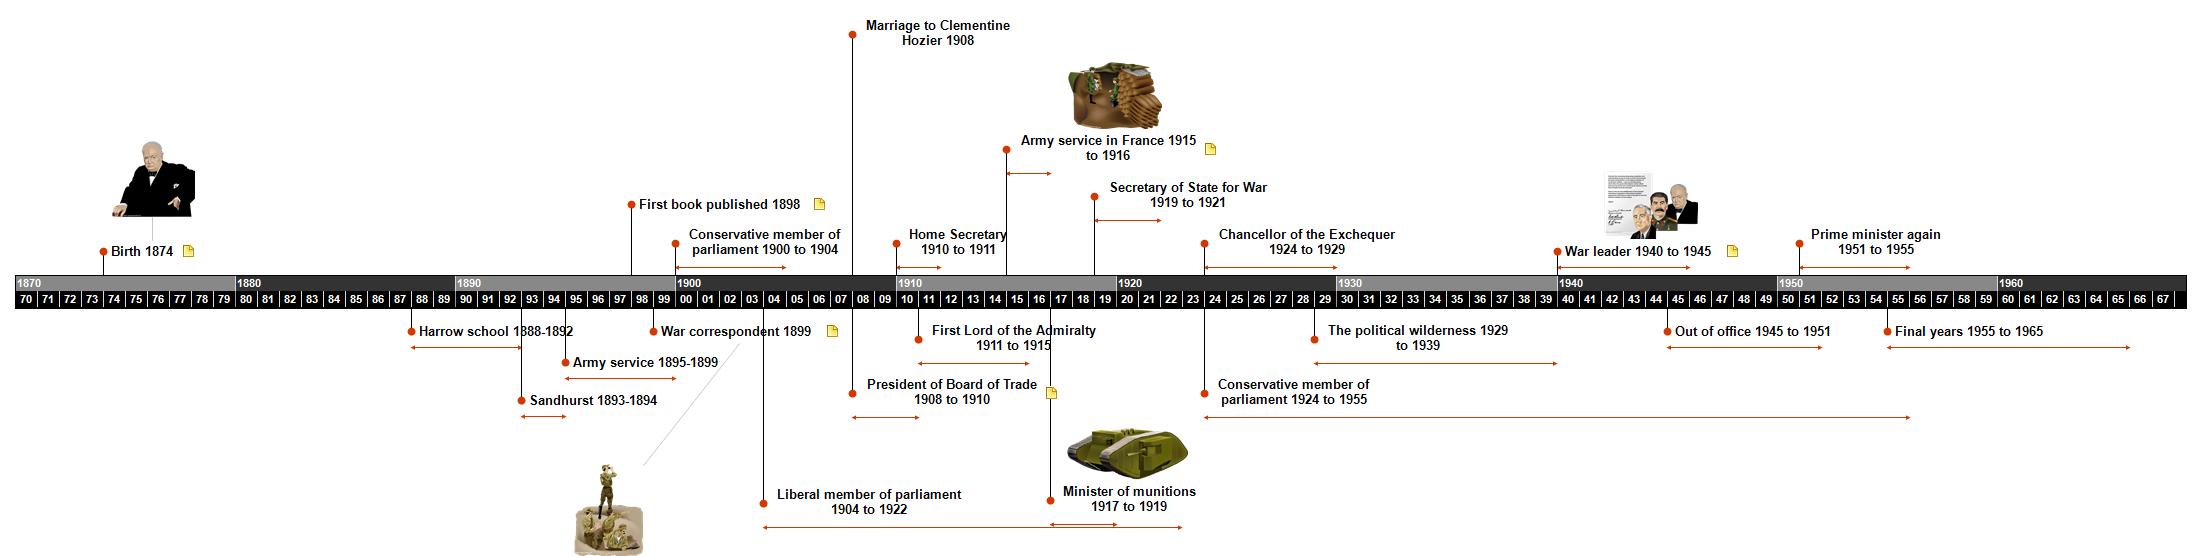 Winston Churchill 1874 - 1965 Timeline